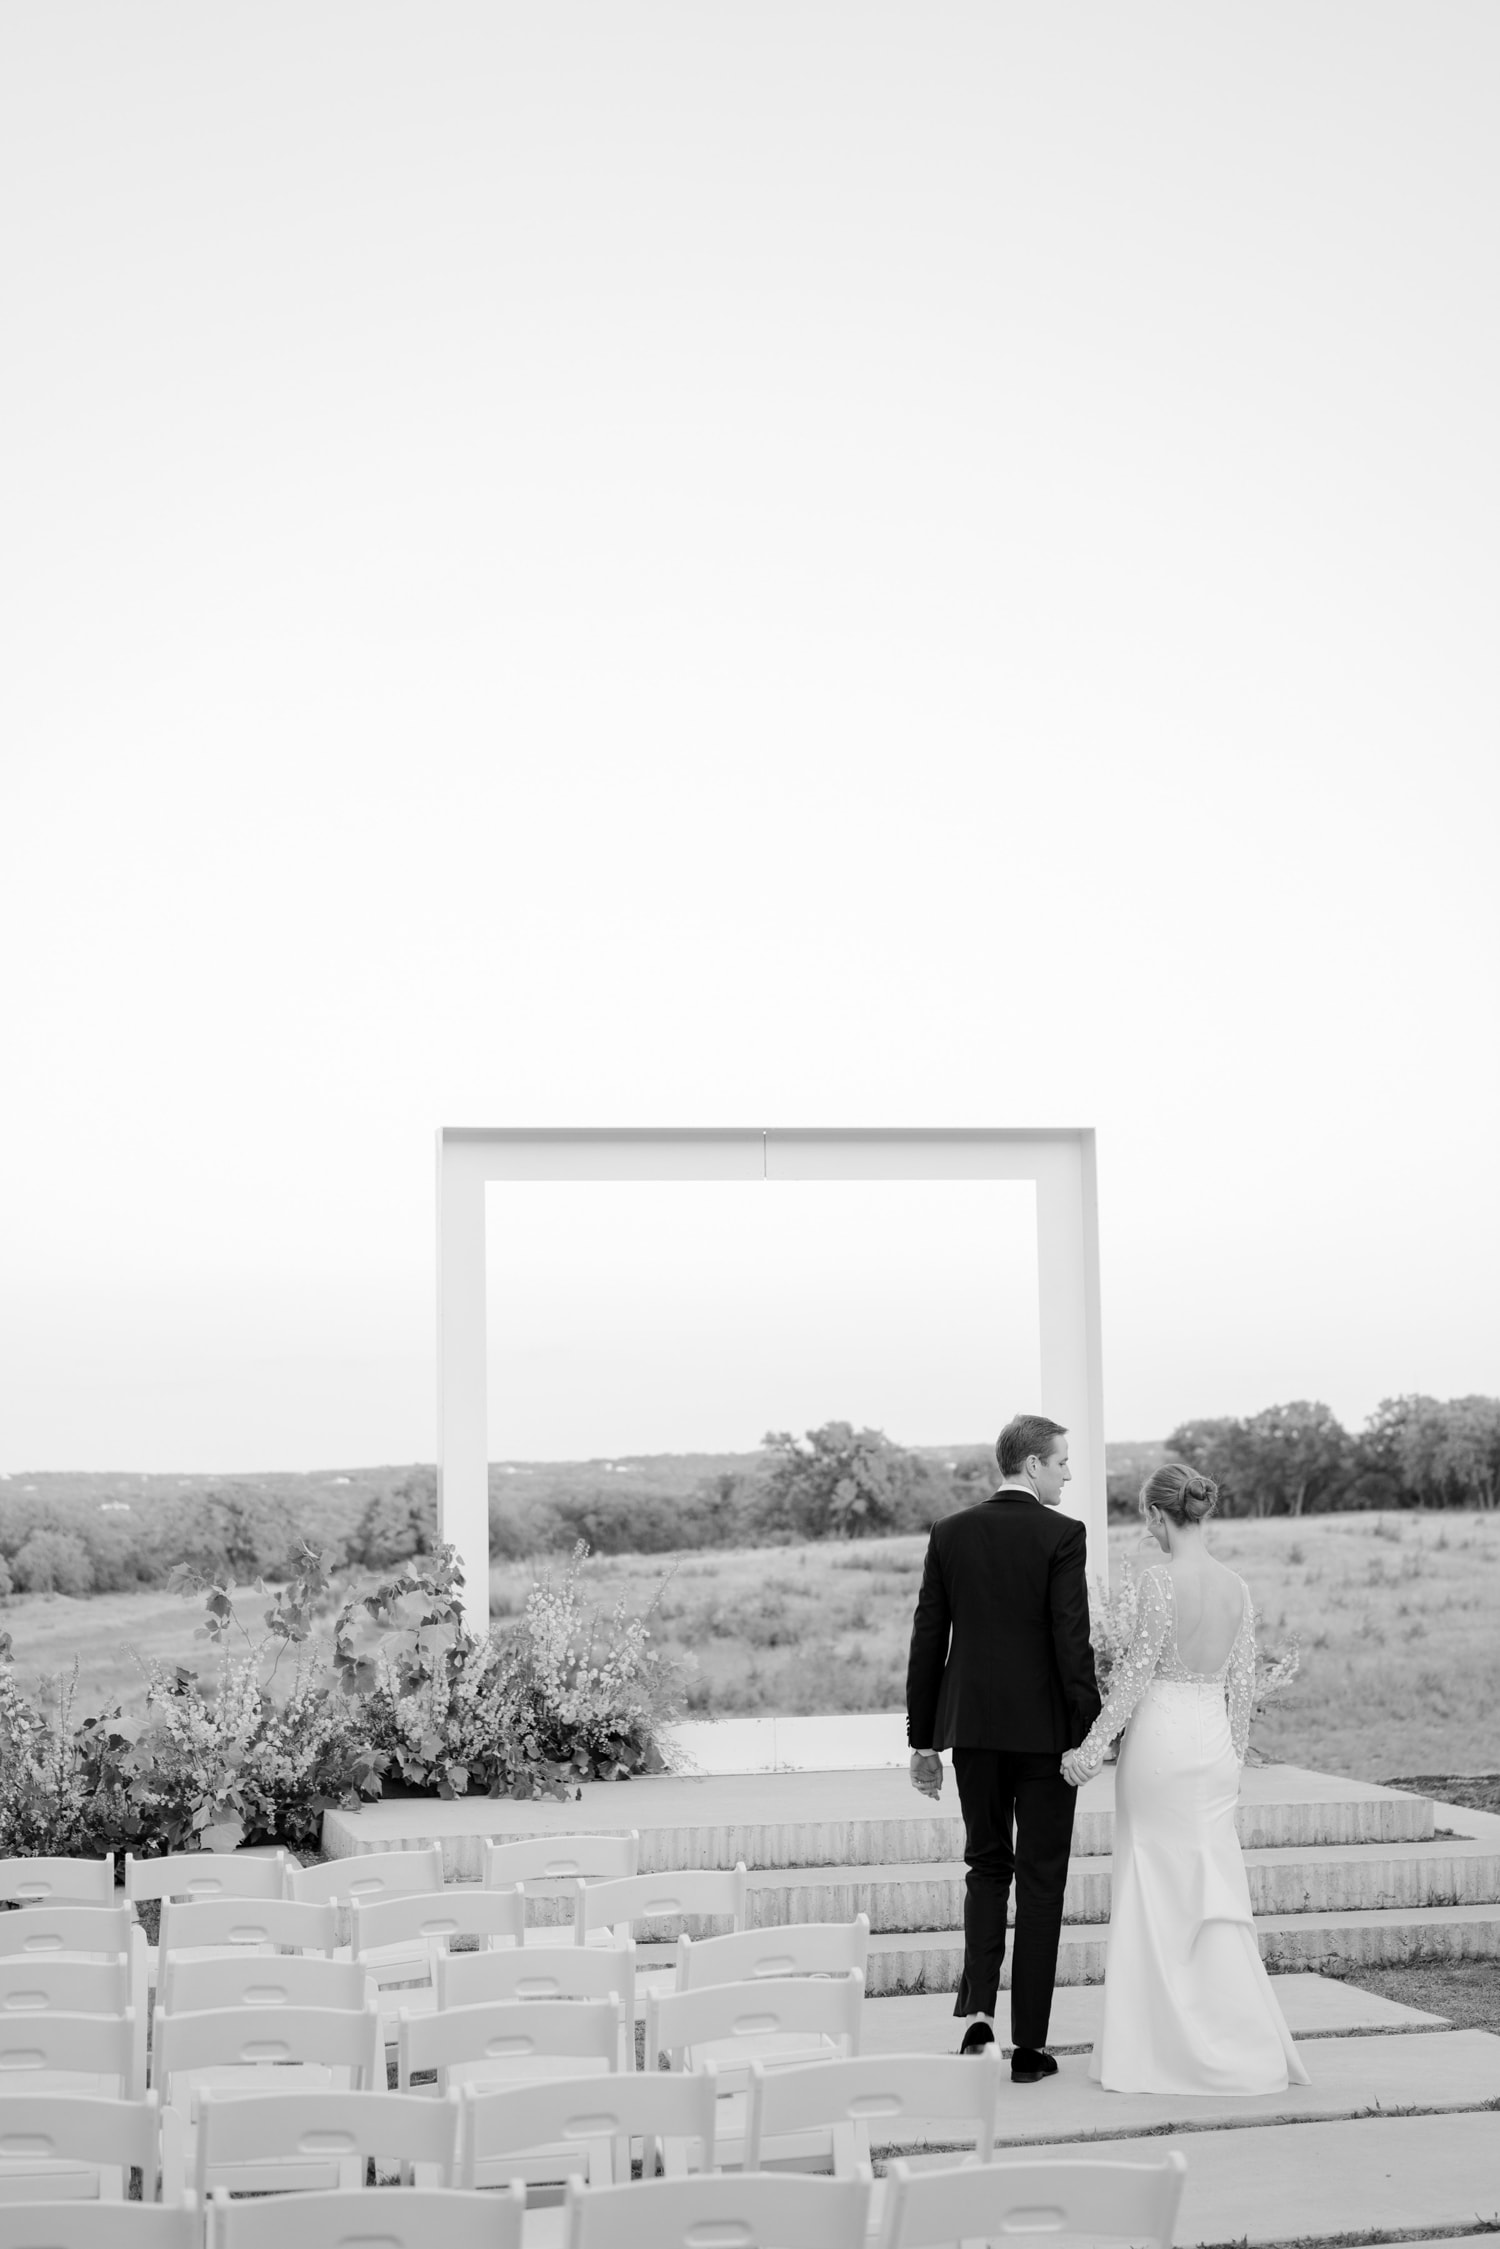 PROSPECT_HOUSE_WEDDING_AUSTIN_TX_MATTHEW_MOORE-00840.jpg